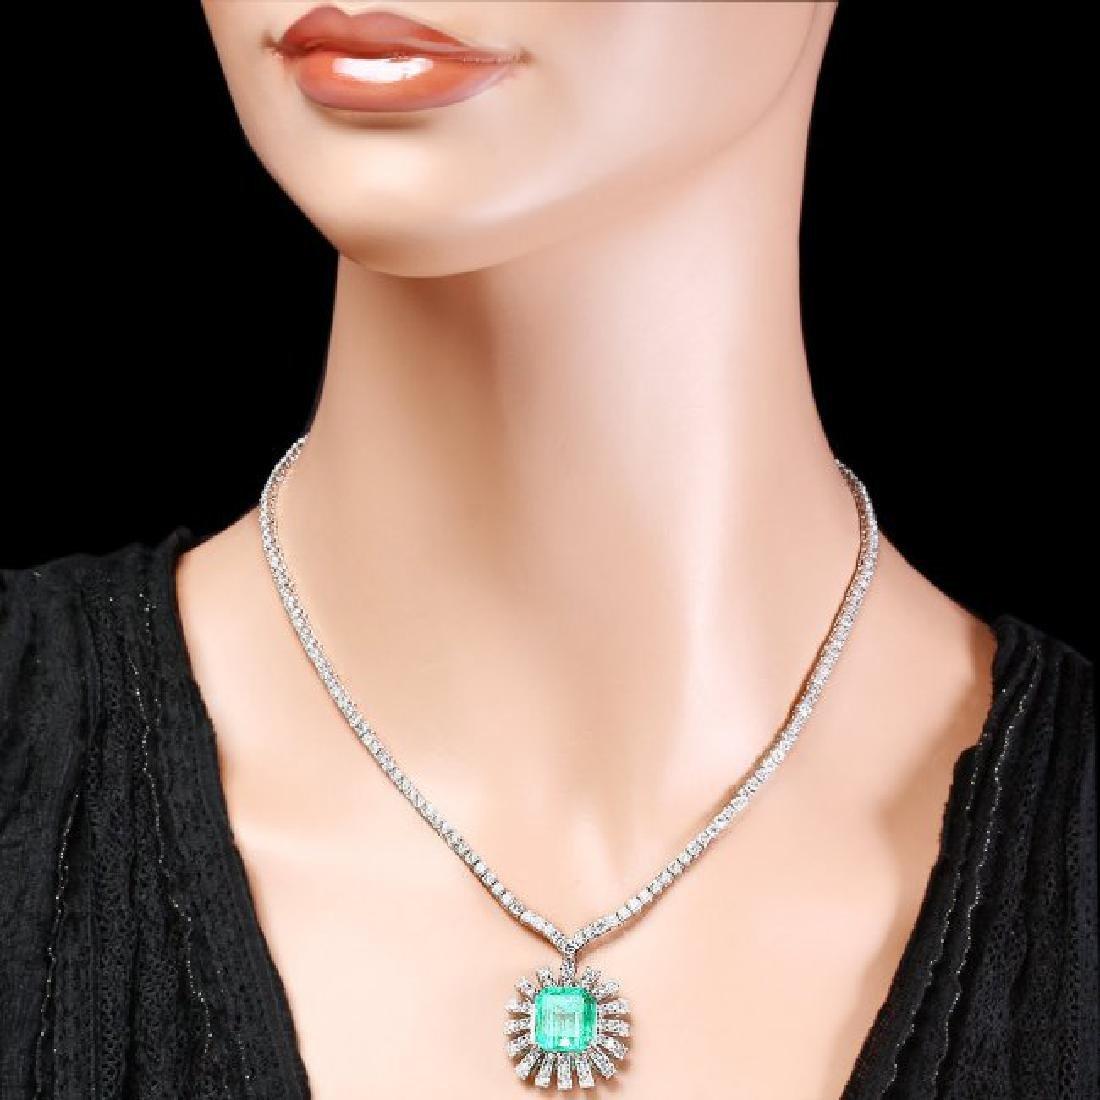 18k Gold 9.00ct Emerald 11ct Diamond Necklace - 5